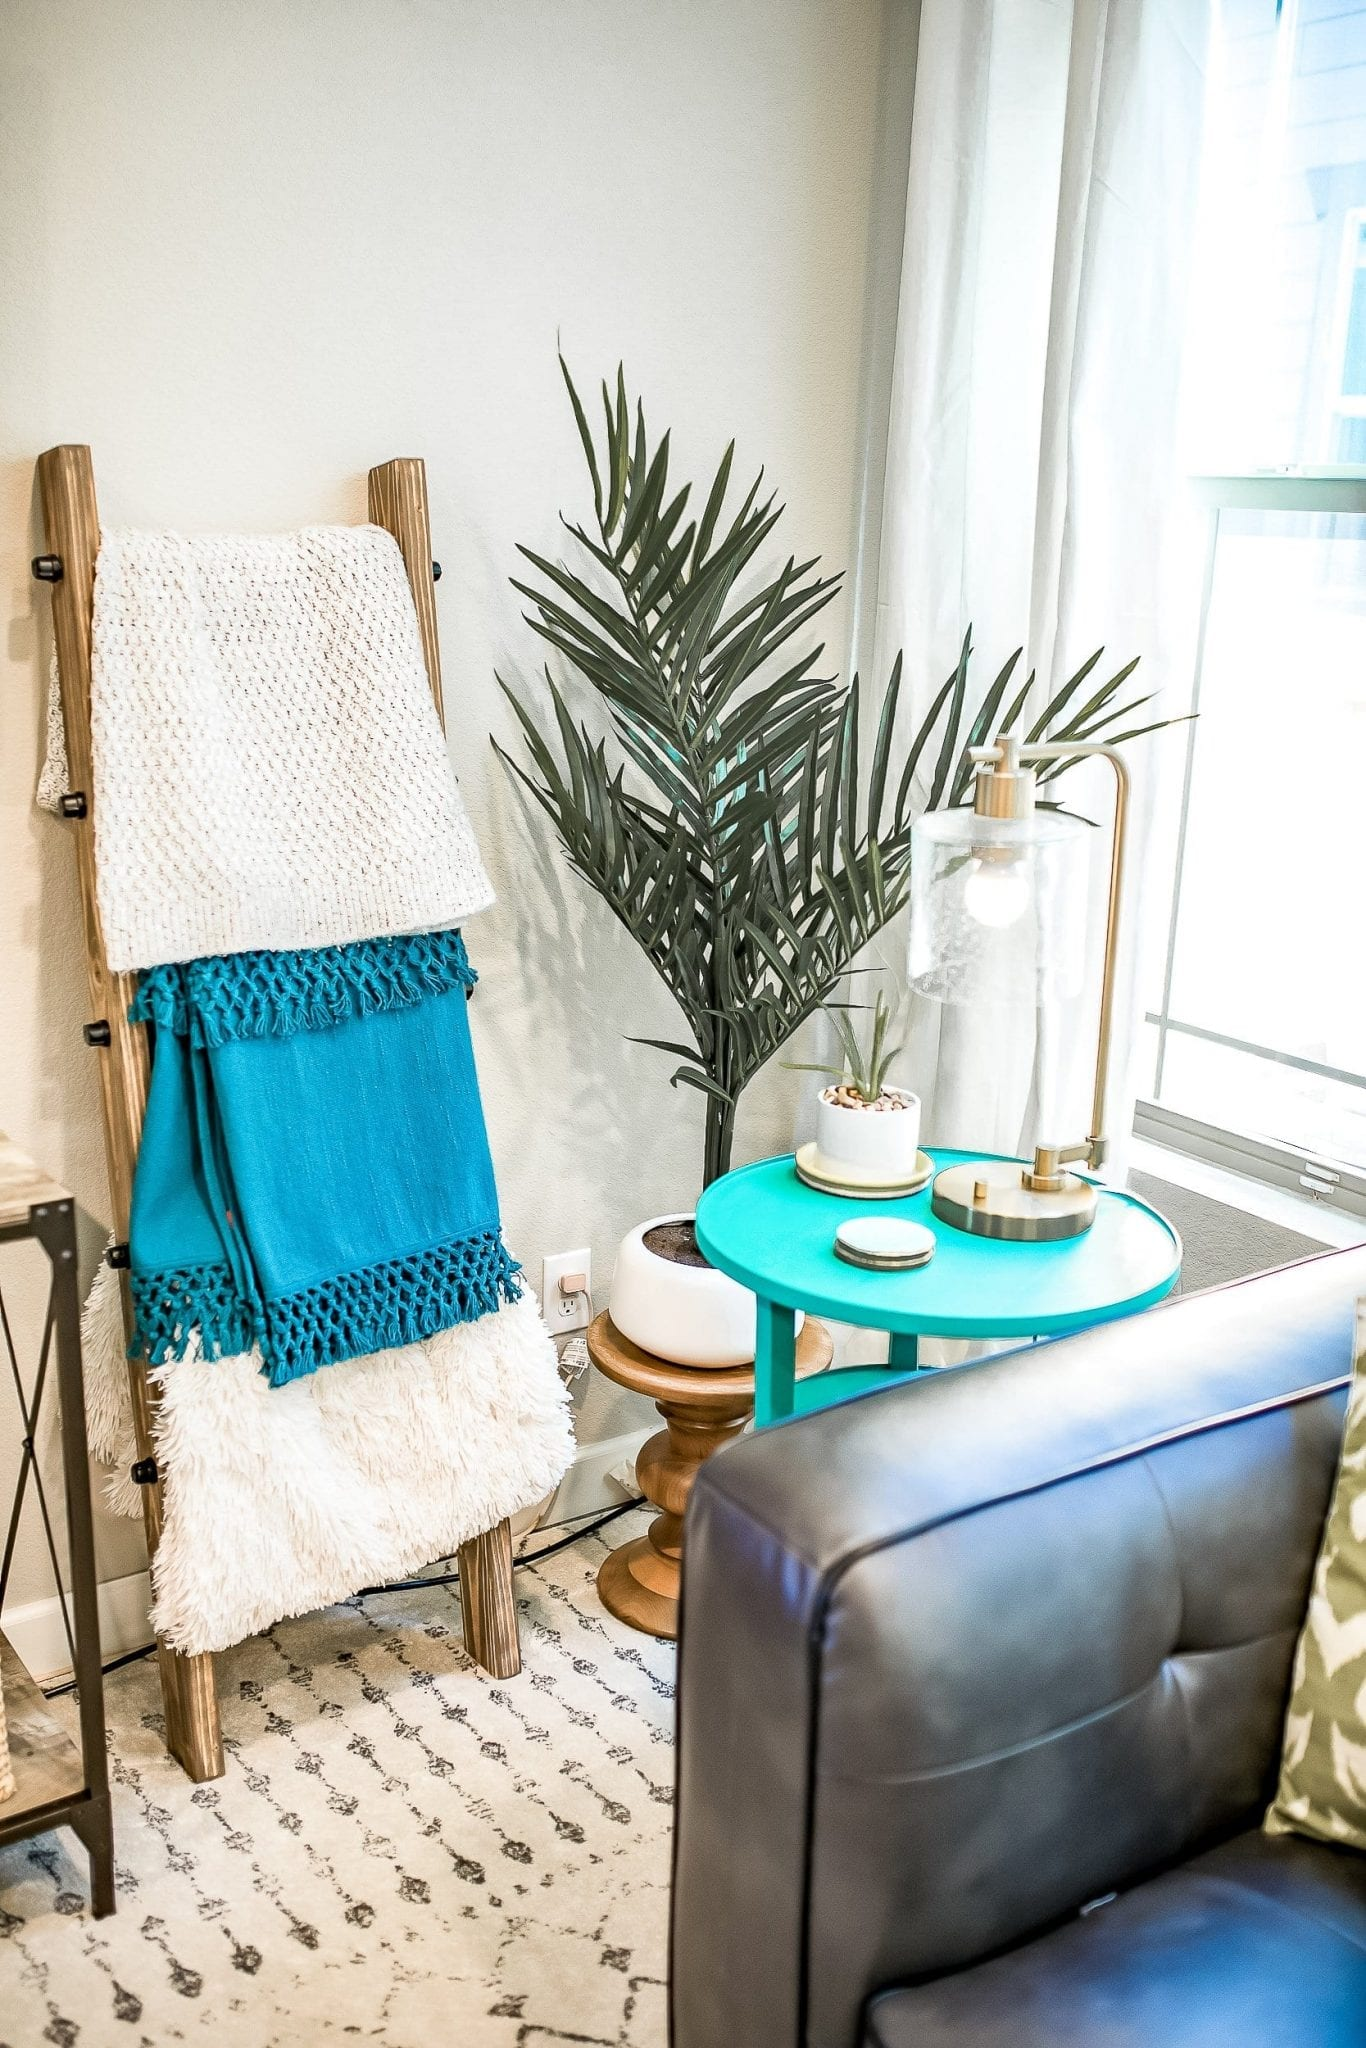 living room decor   Living Room Ideas   living room decor ideas   living room designs   living room paint color ideas   living room refresh   Never Skip Brunch by Cara Newhart   #livingroom #home #decor #neverskipbrunch